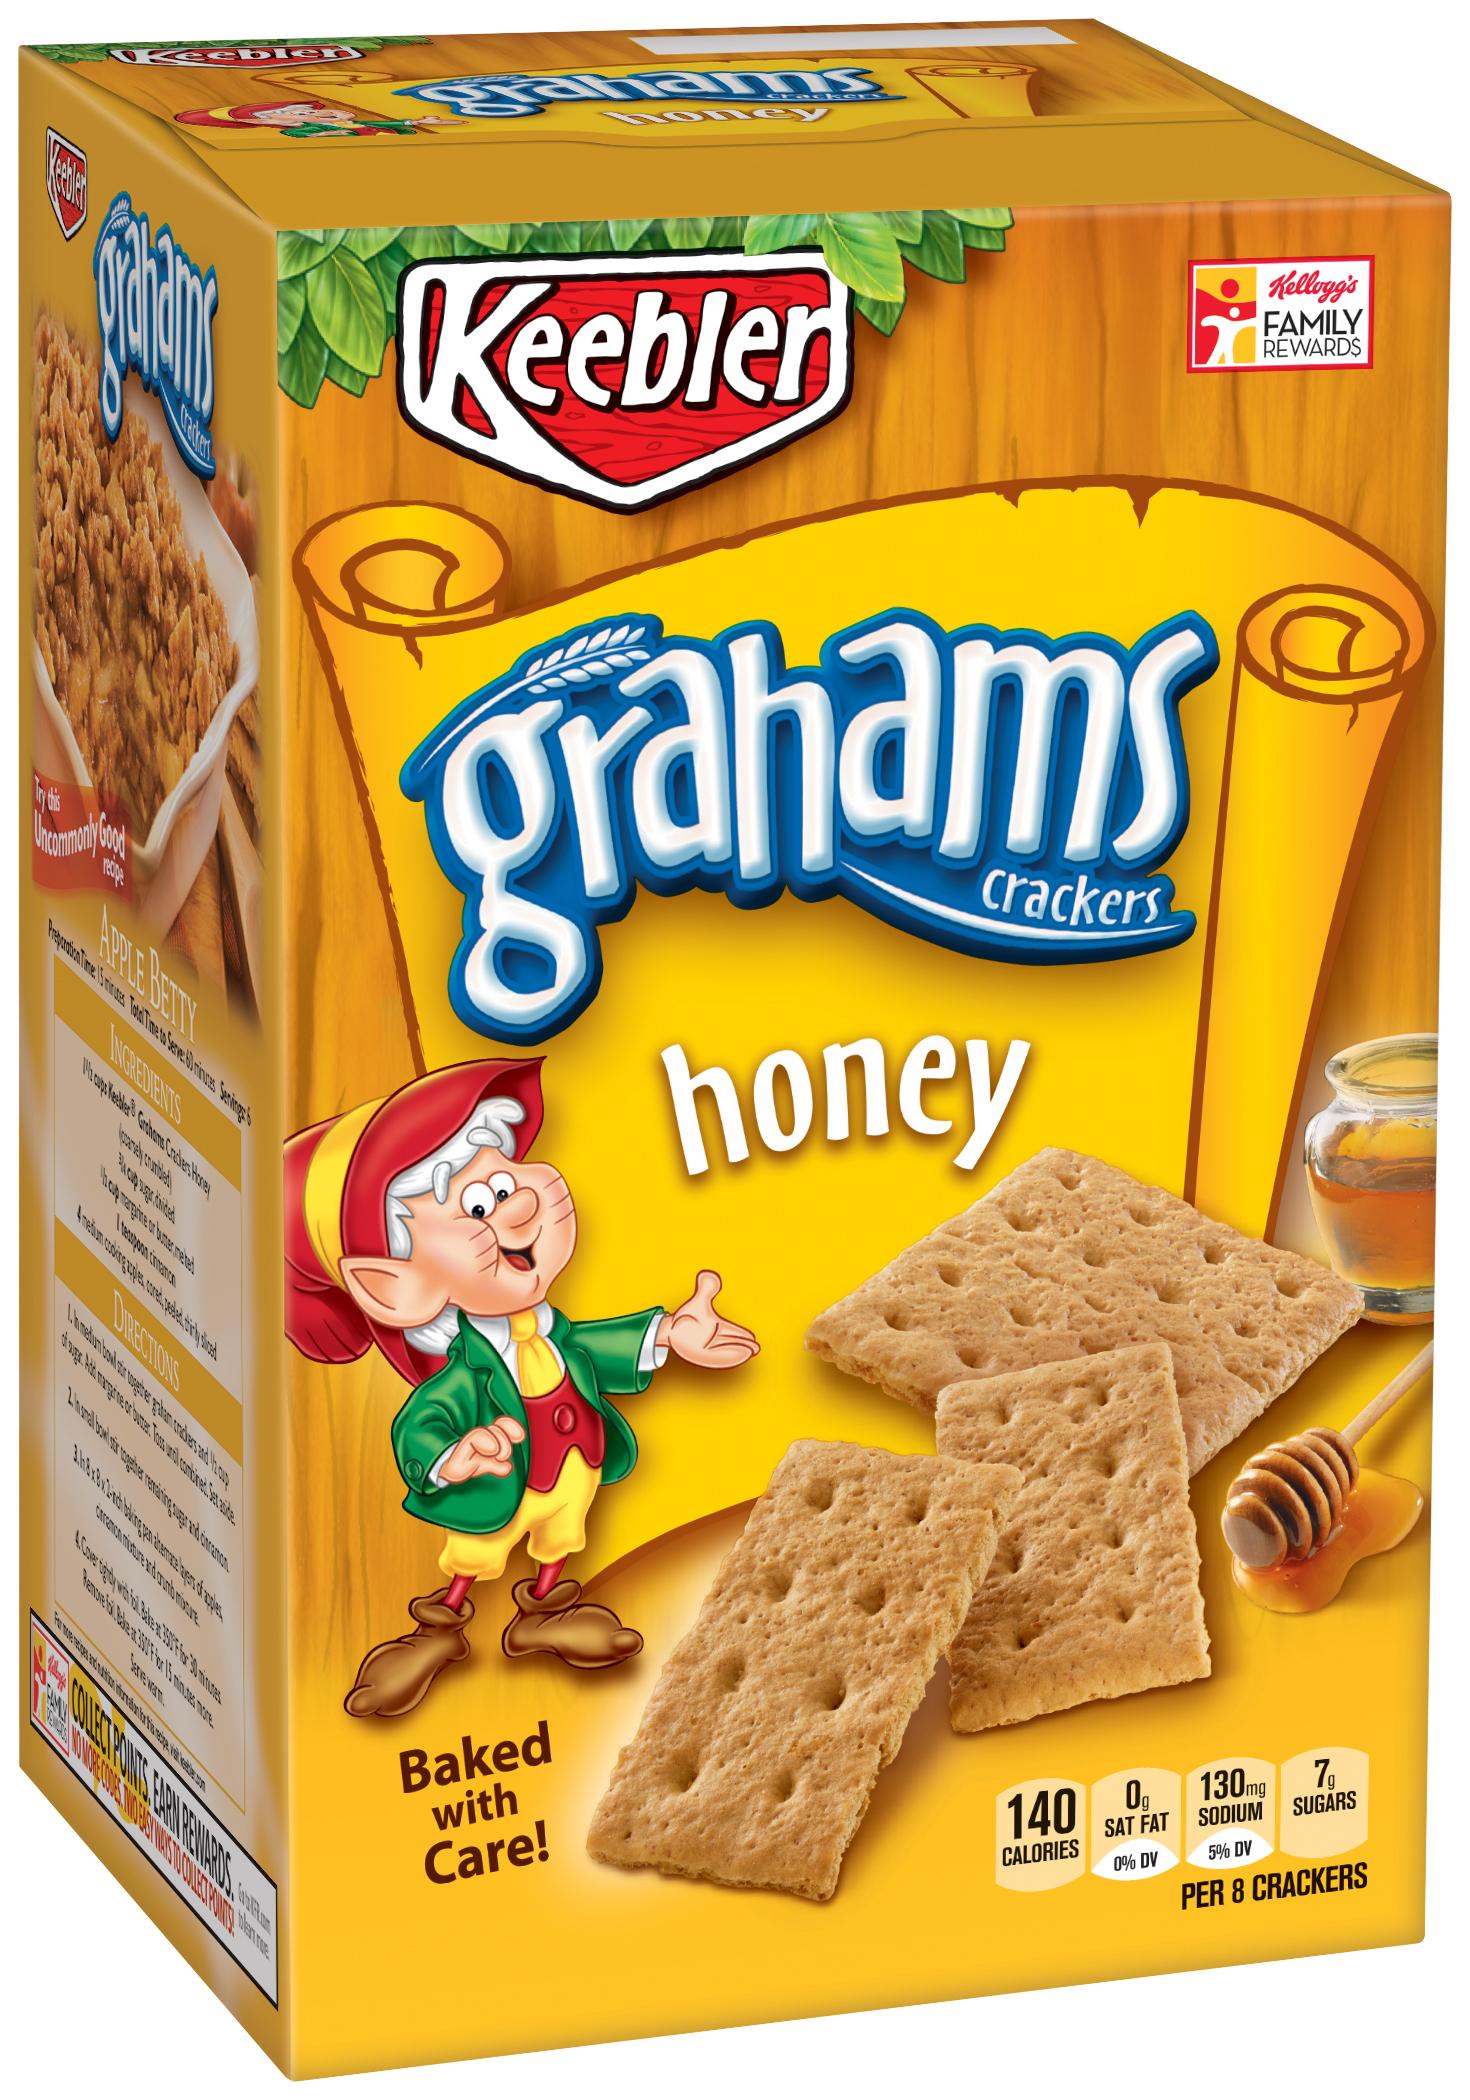 Image Gallery keebler graham crackers